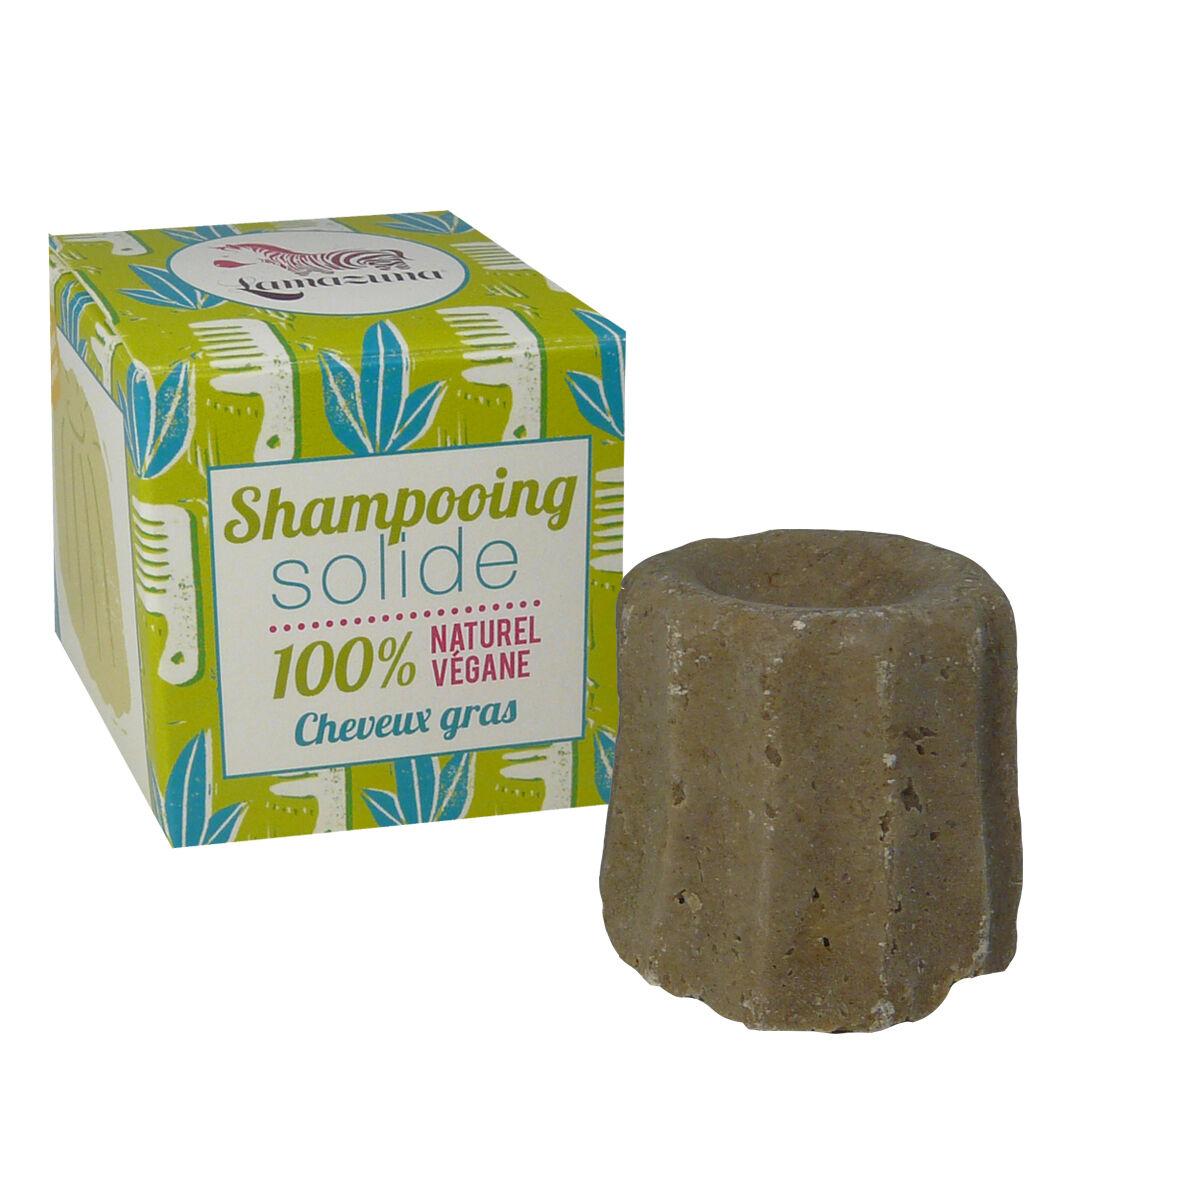 Lamazuna shampooing solide 100 % cheveux gras 55 g